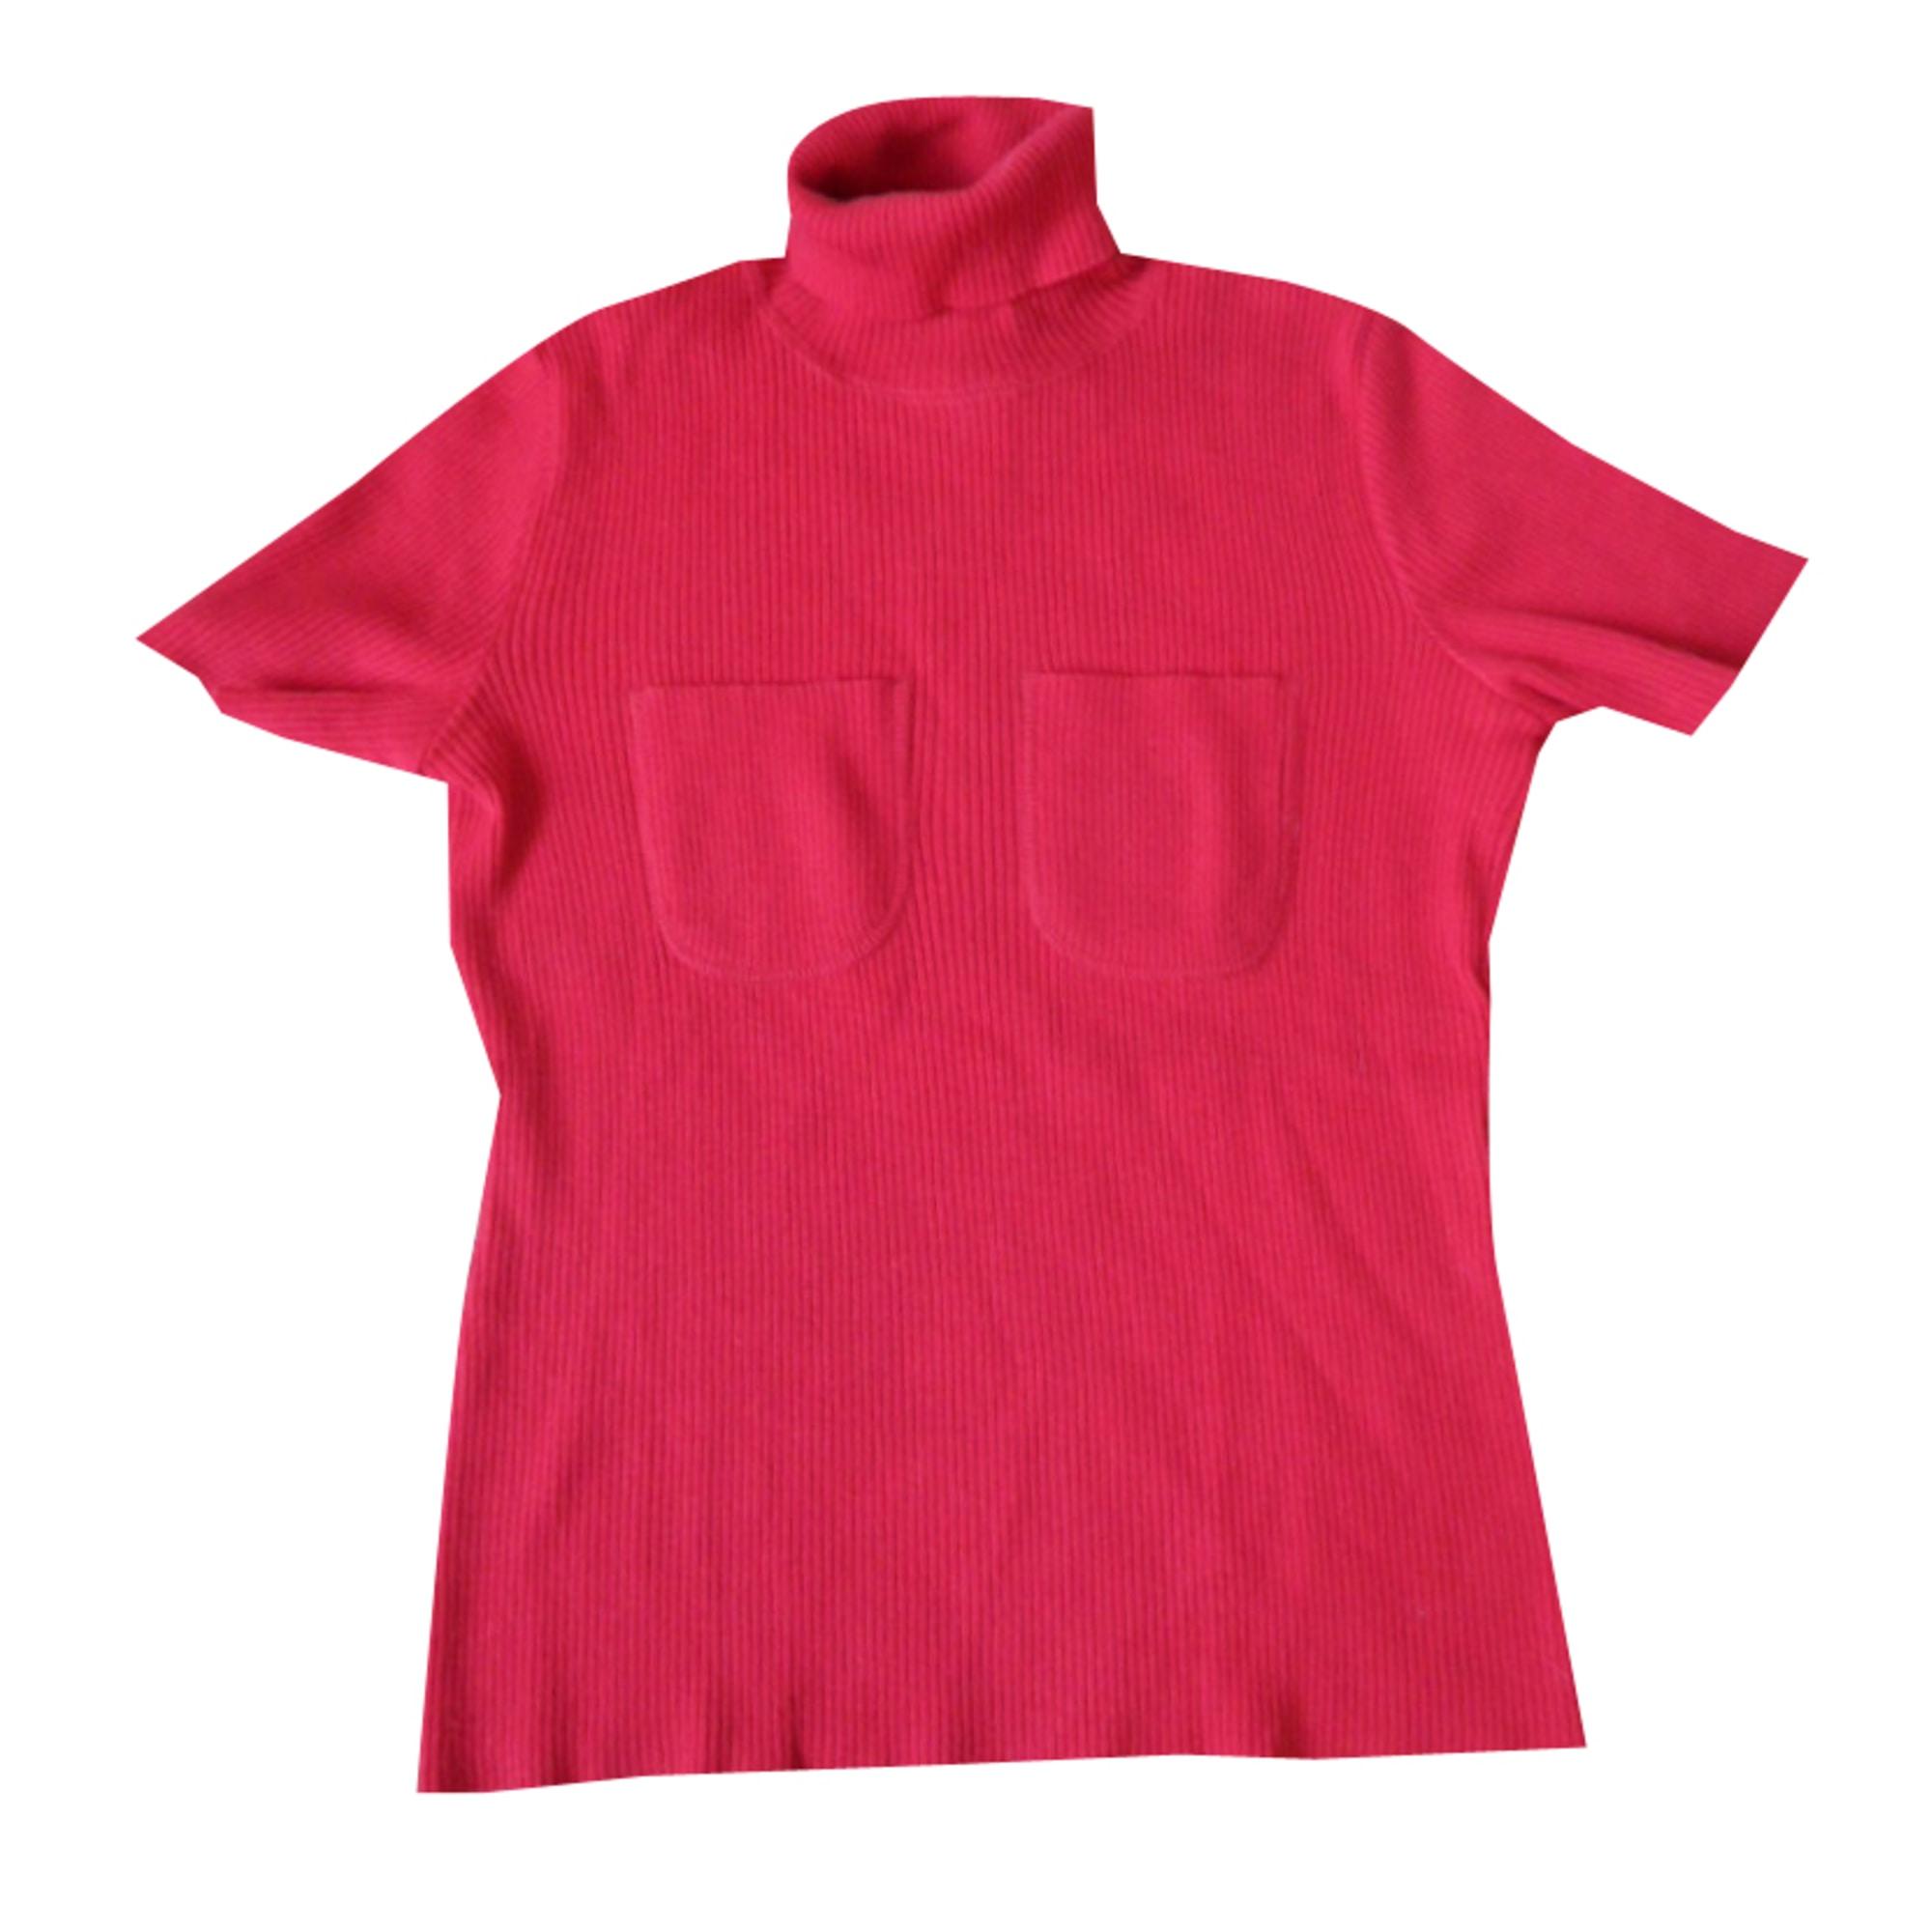 Pull KENZO 42 (L XL, T4) rouge - 1136010 5b9545ae75d